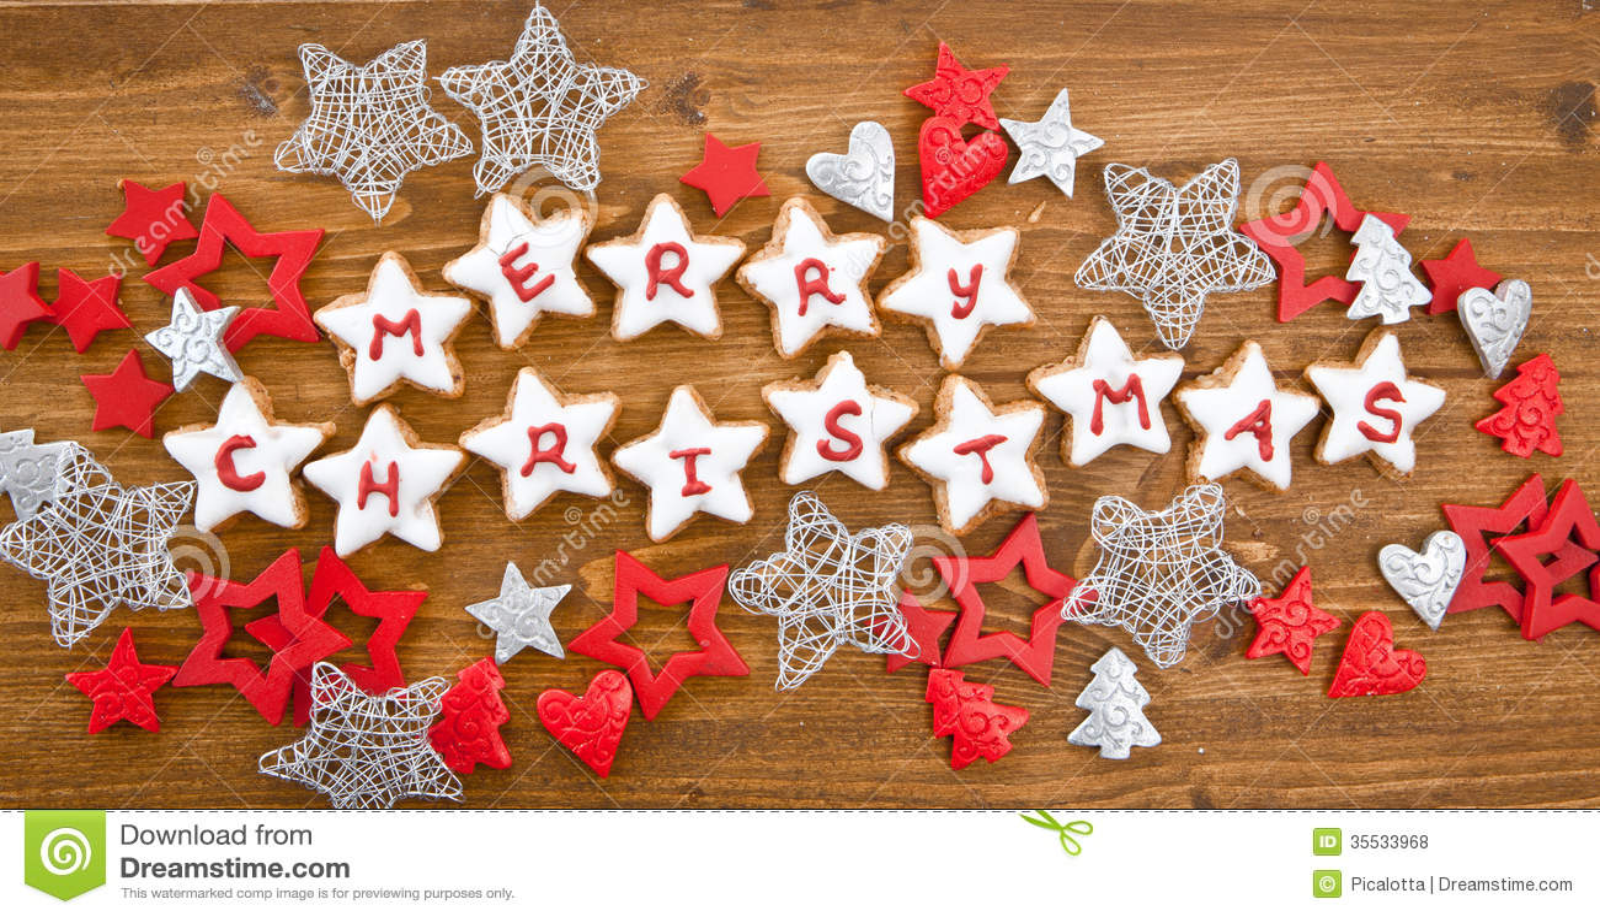 Merry Christmas Written On Cookies Stock Photo Image Of Horizontal